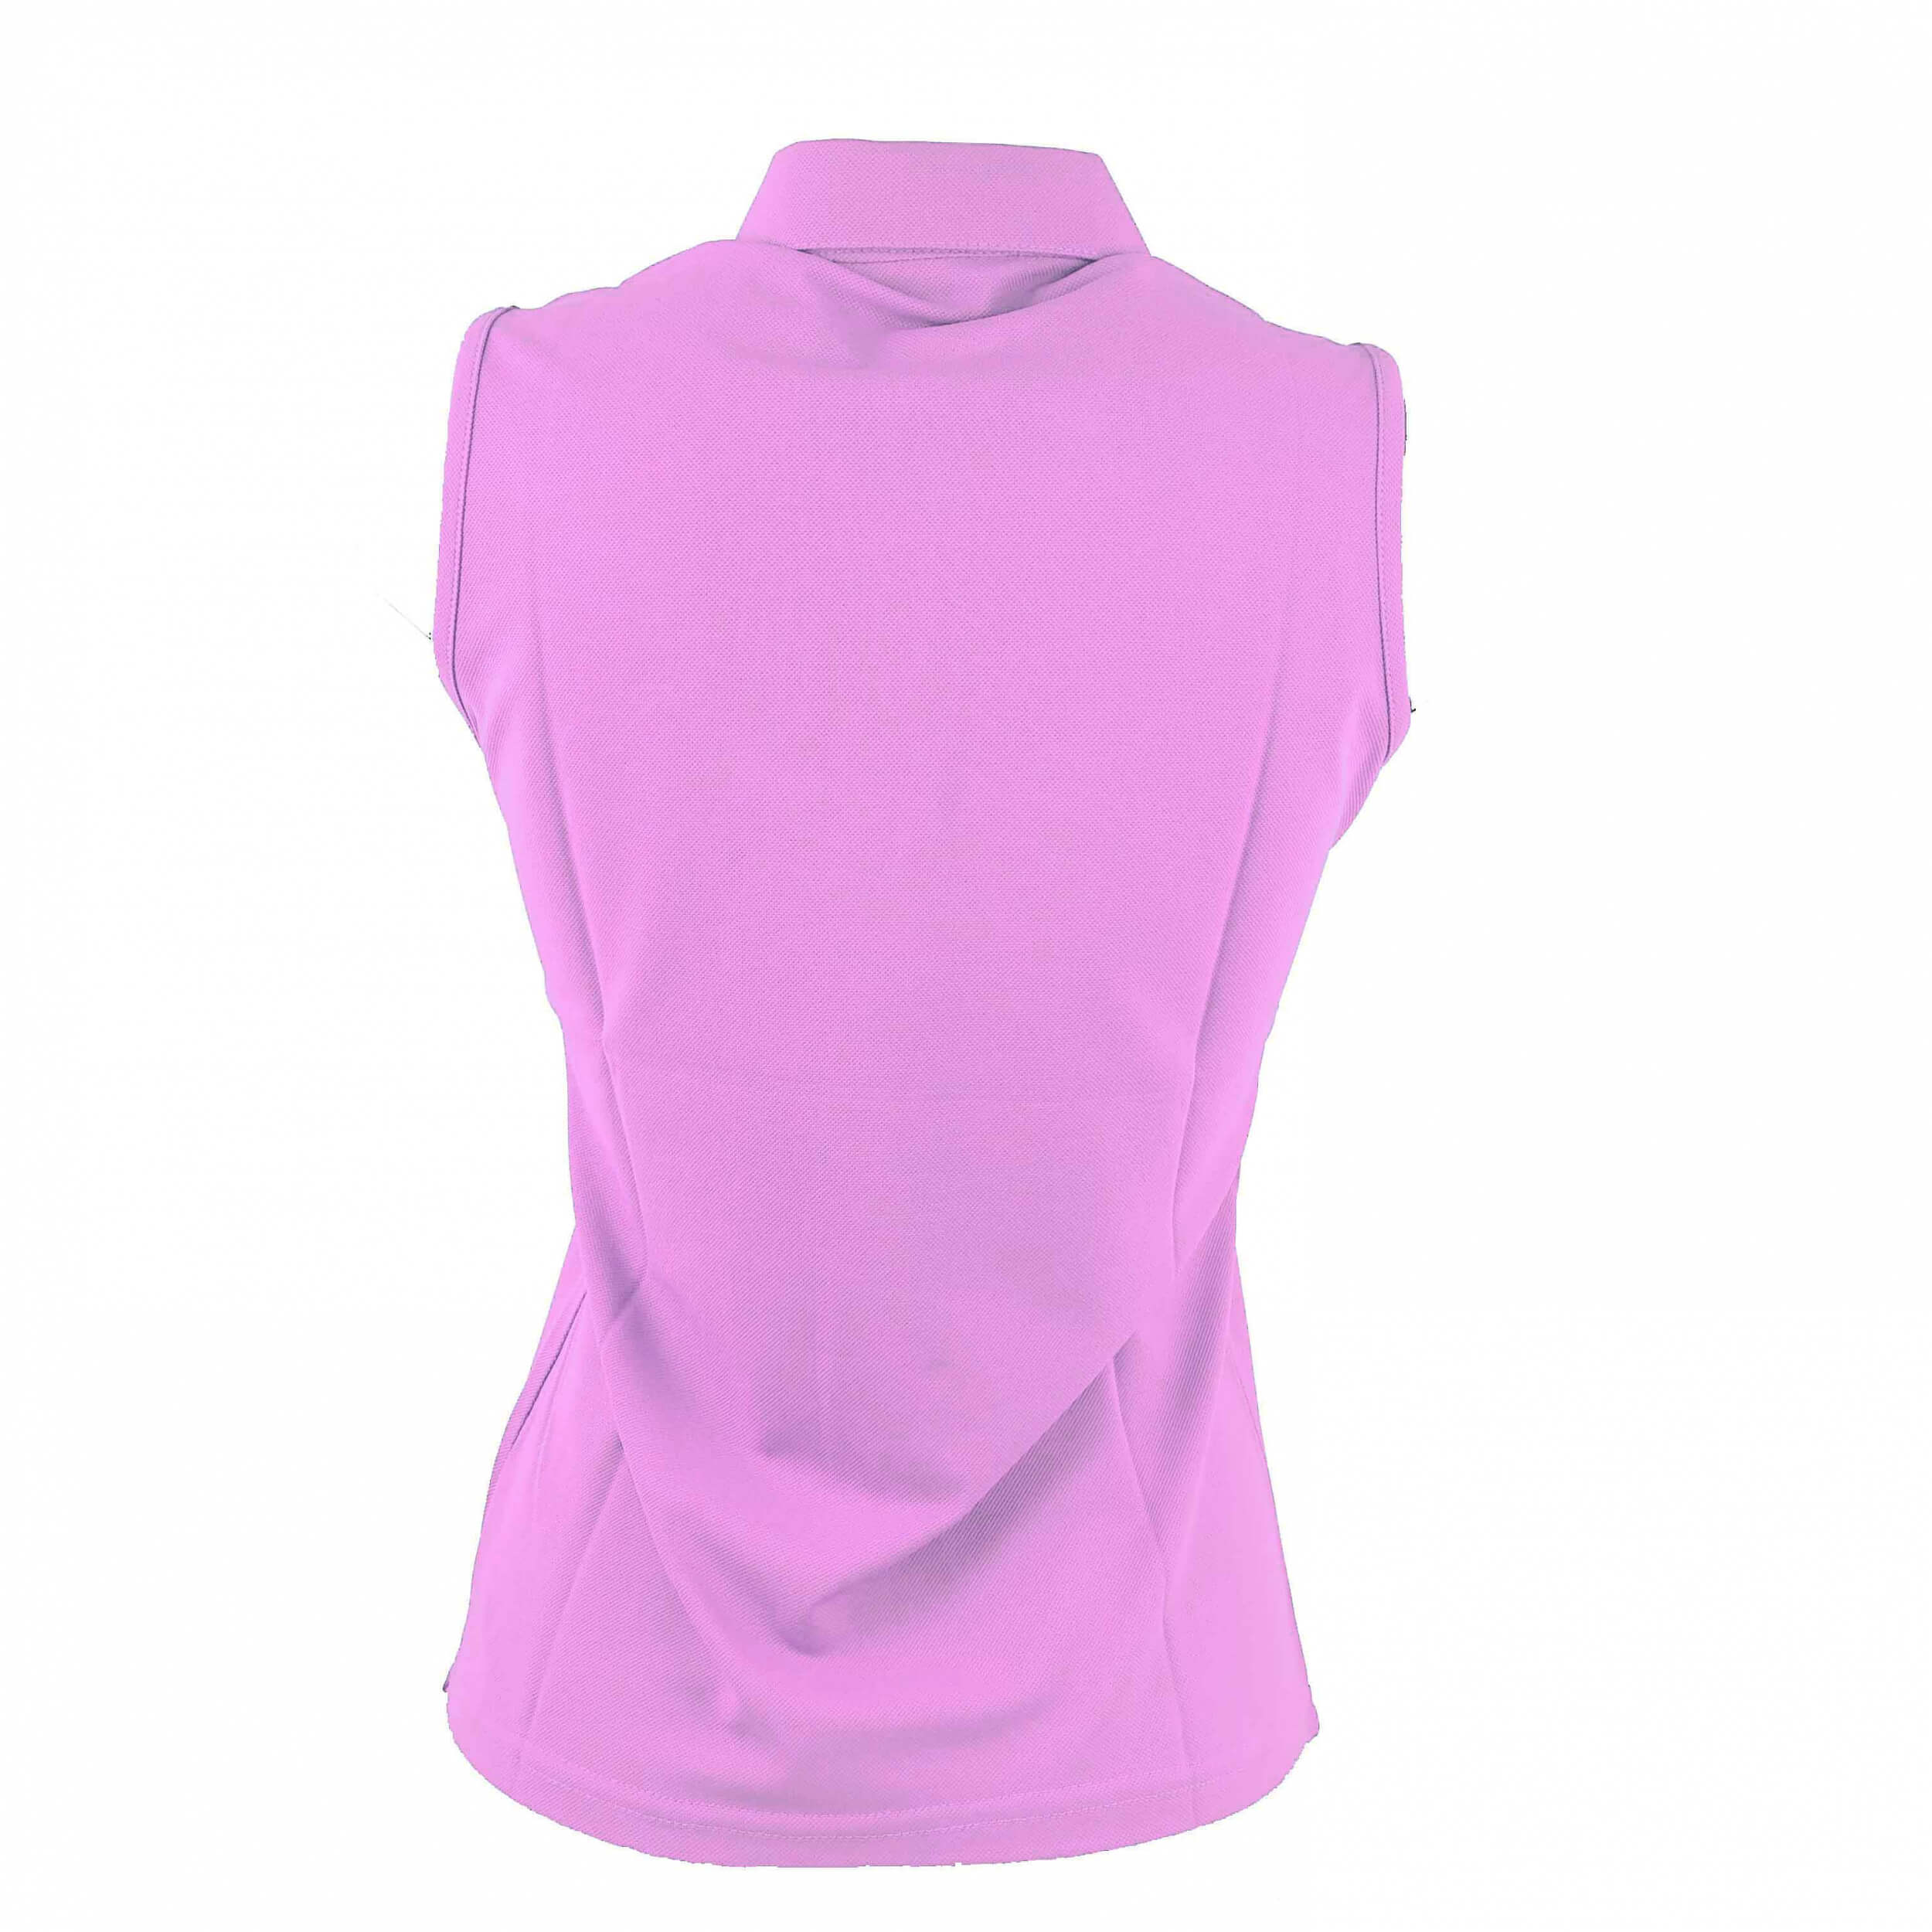 Chervo Damen Top Polo Auguri DRY MATIC pink 714